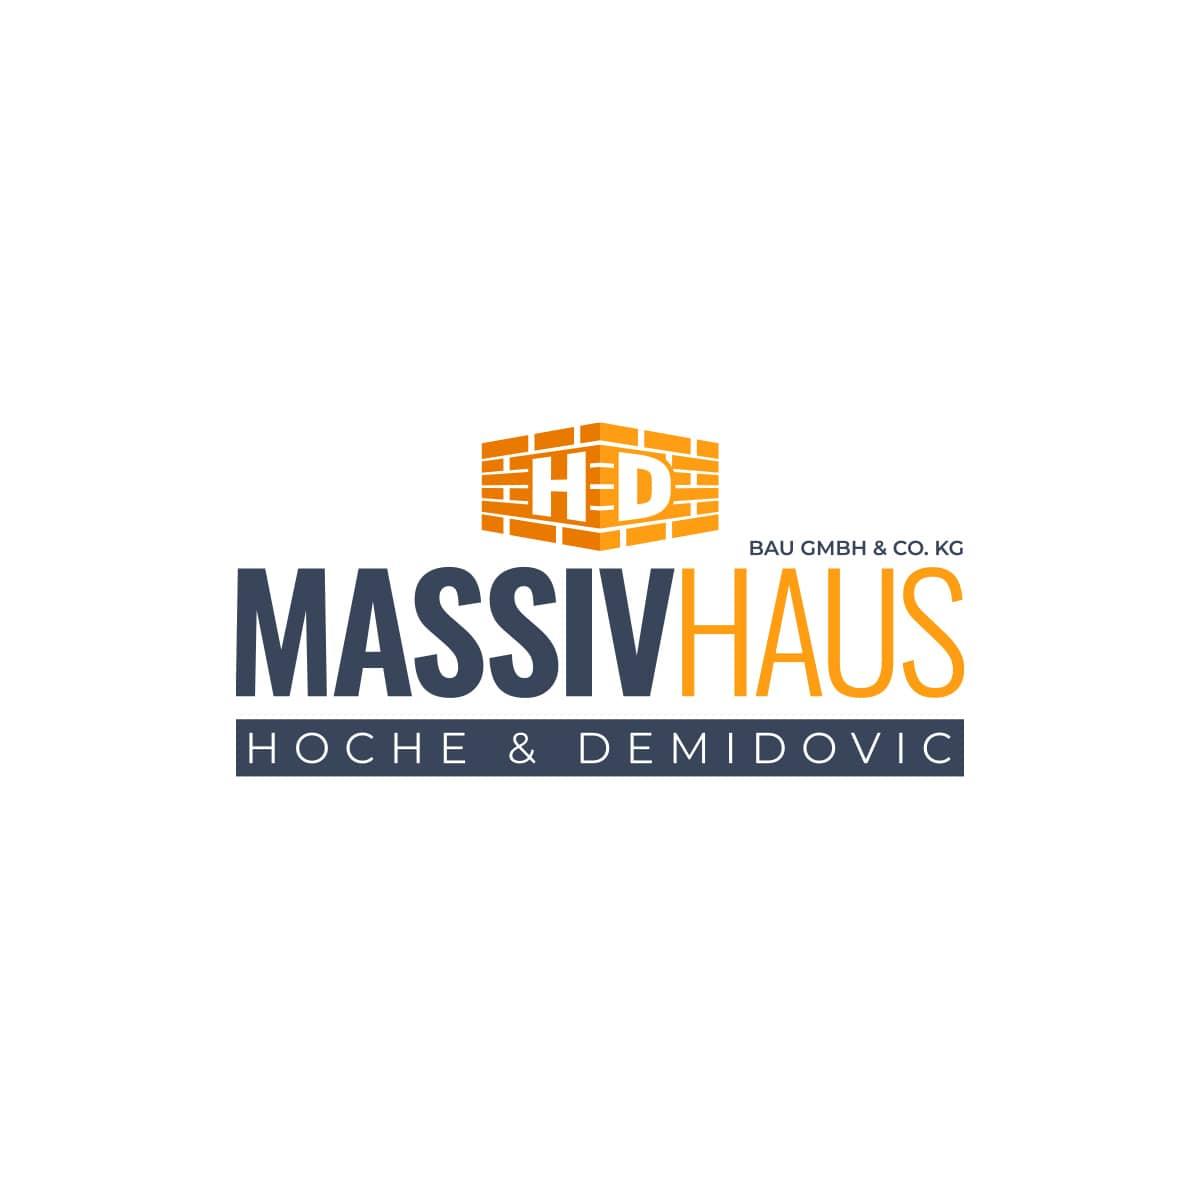 hdmassivhaus logowall